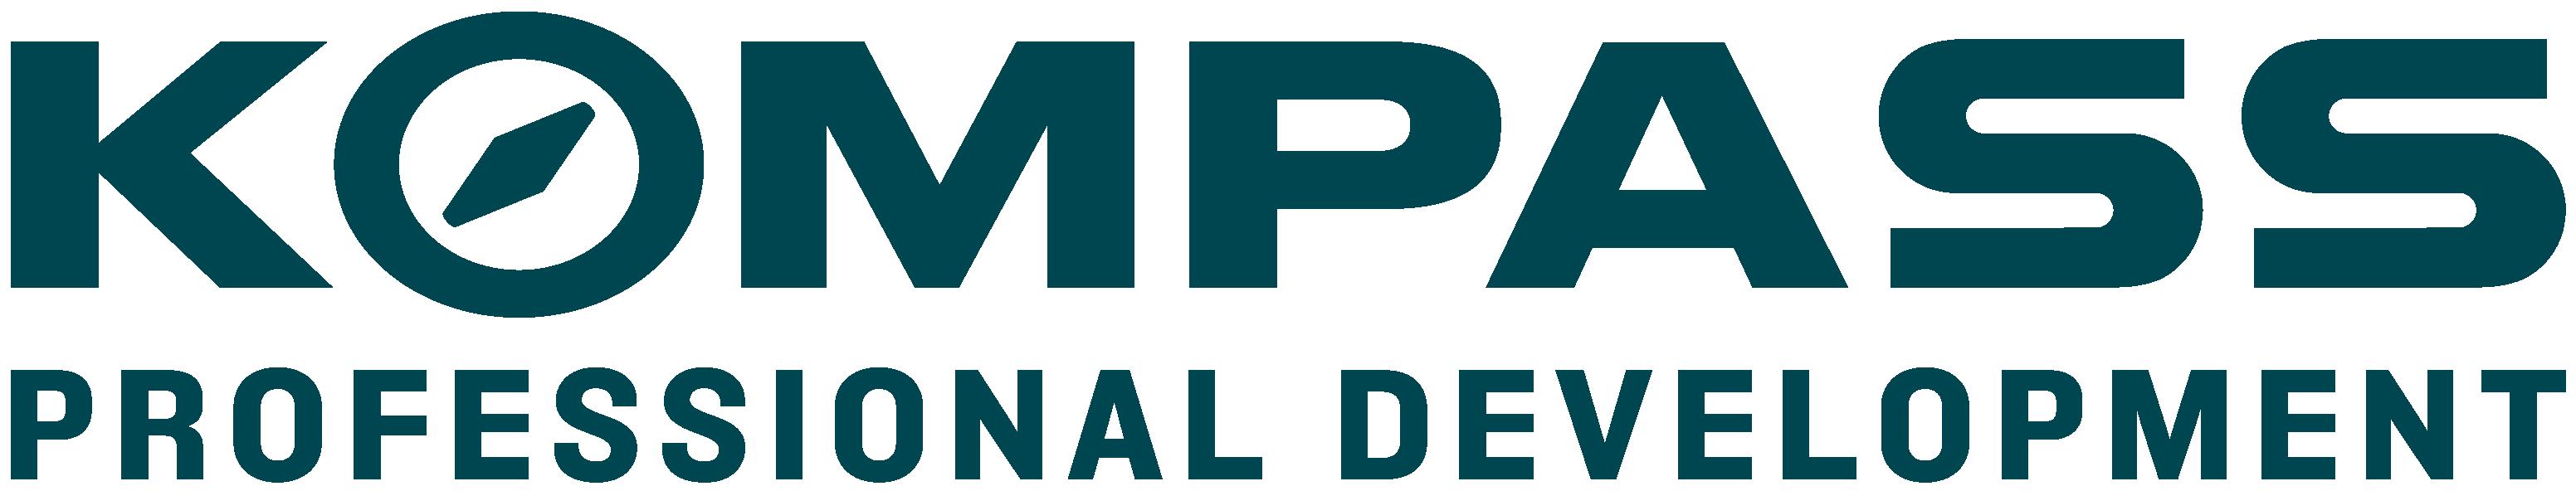 Kompass Professional Development Logo